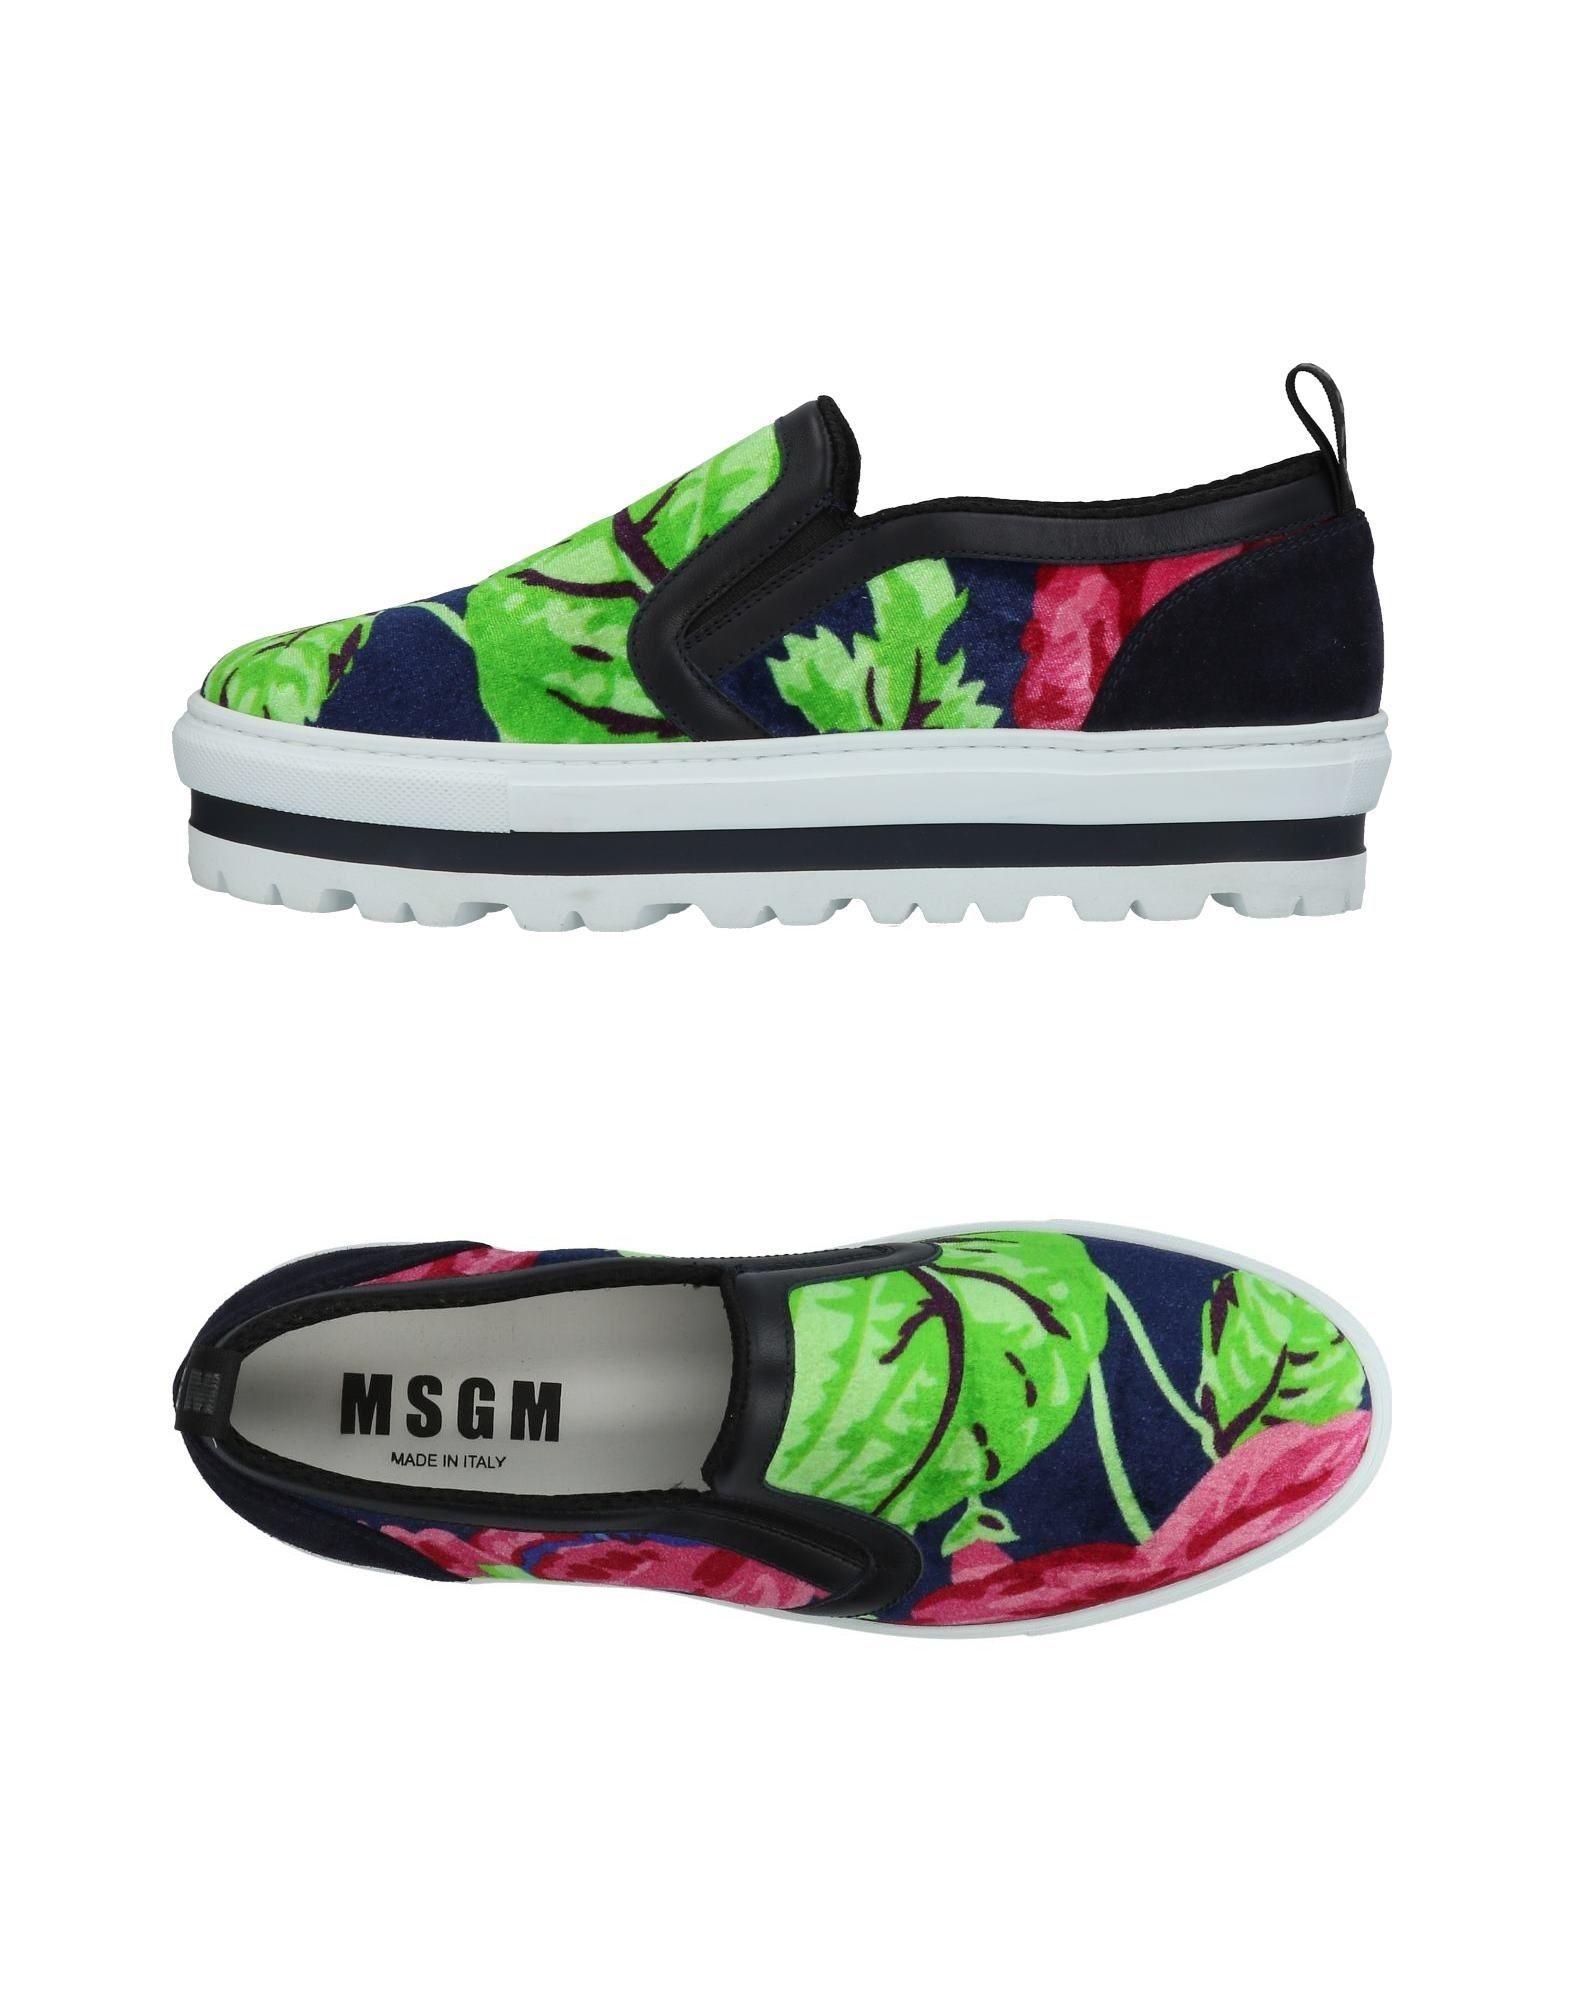 Moda Sneakers Msgm Donna - 11439714JO 11439714JO - 1402b0